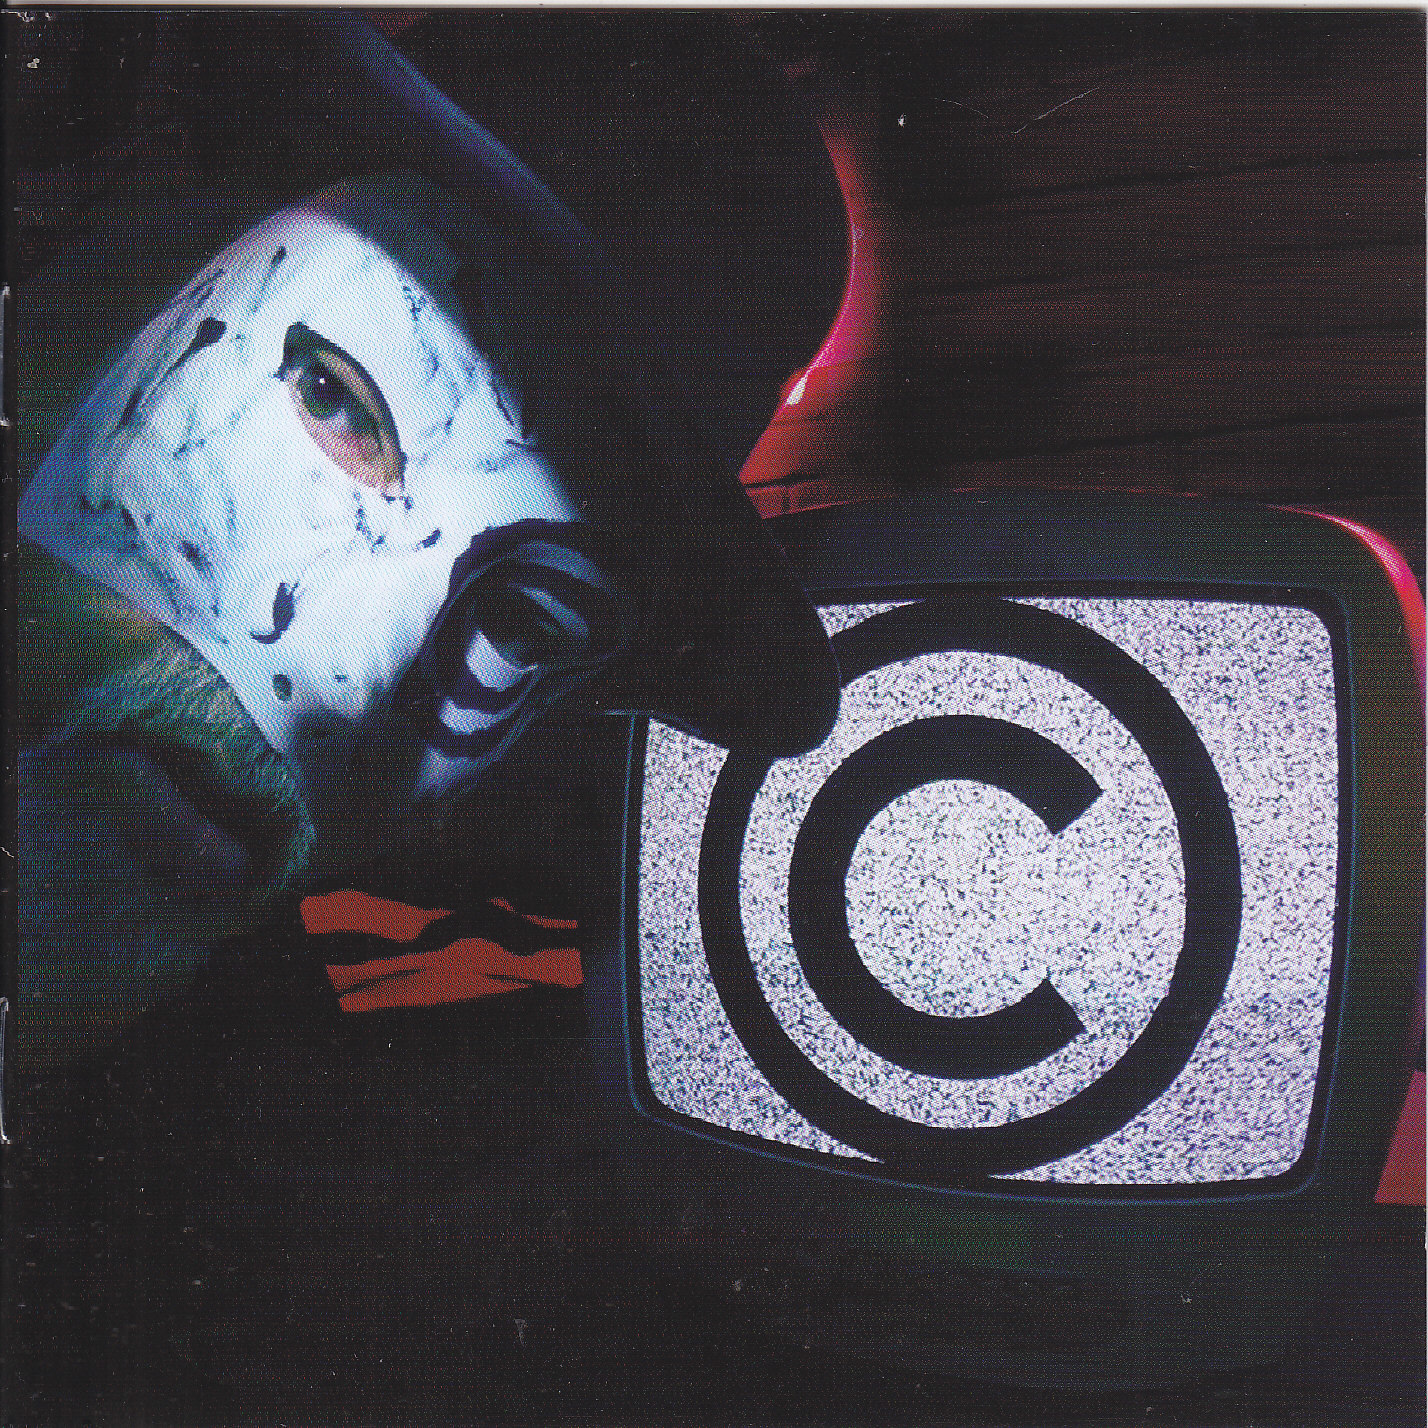 The Cravats – Dustbin of Sound